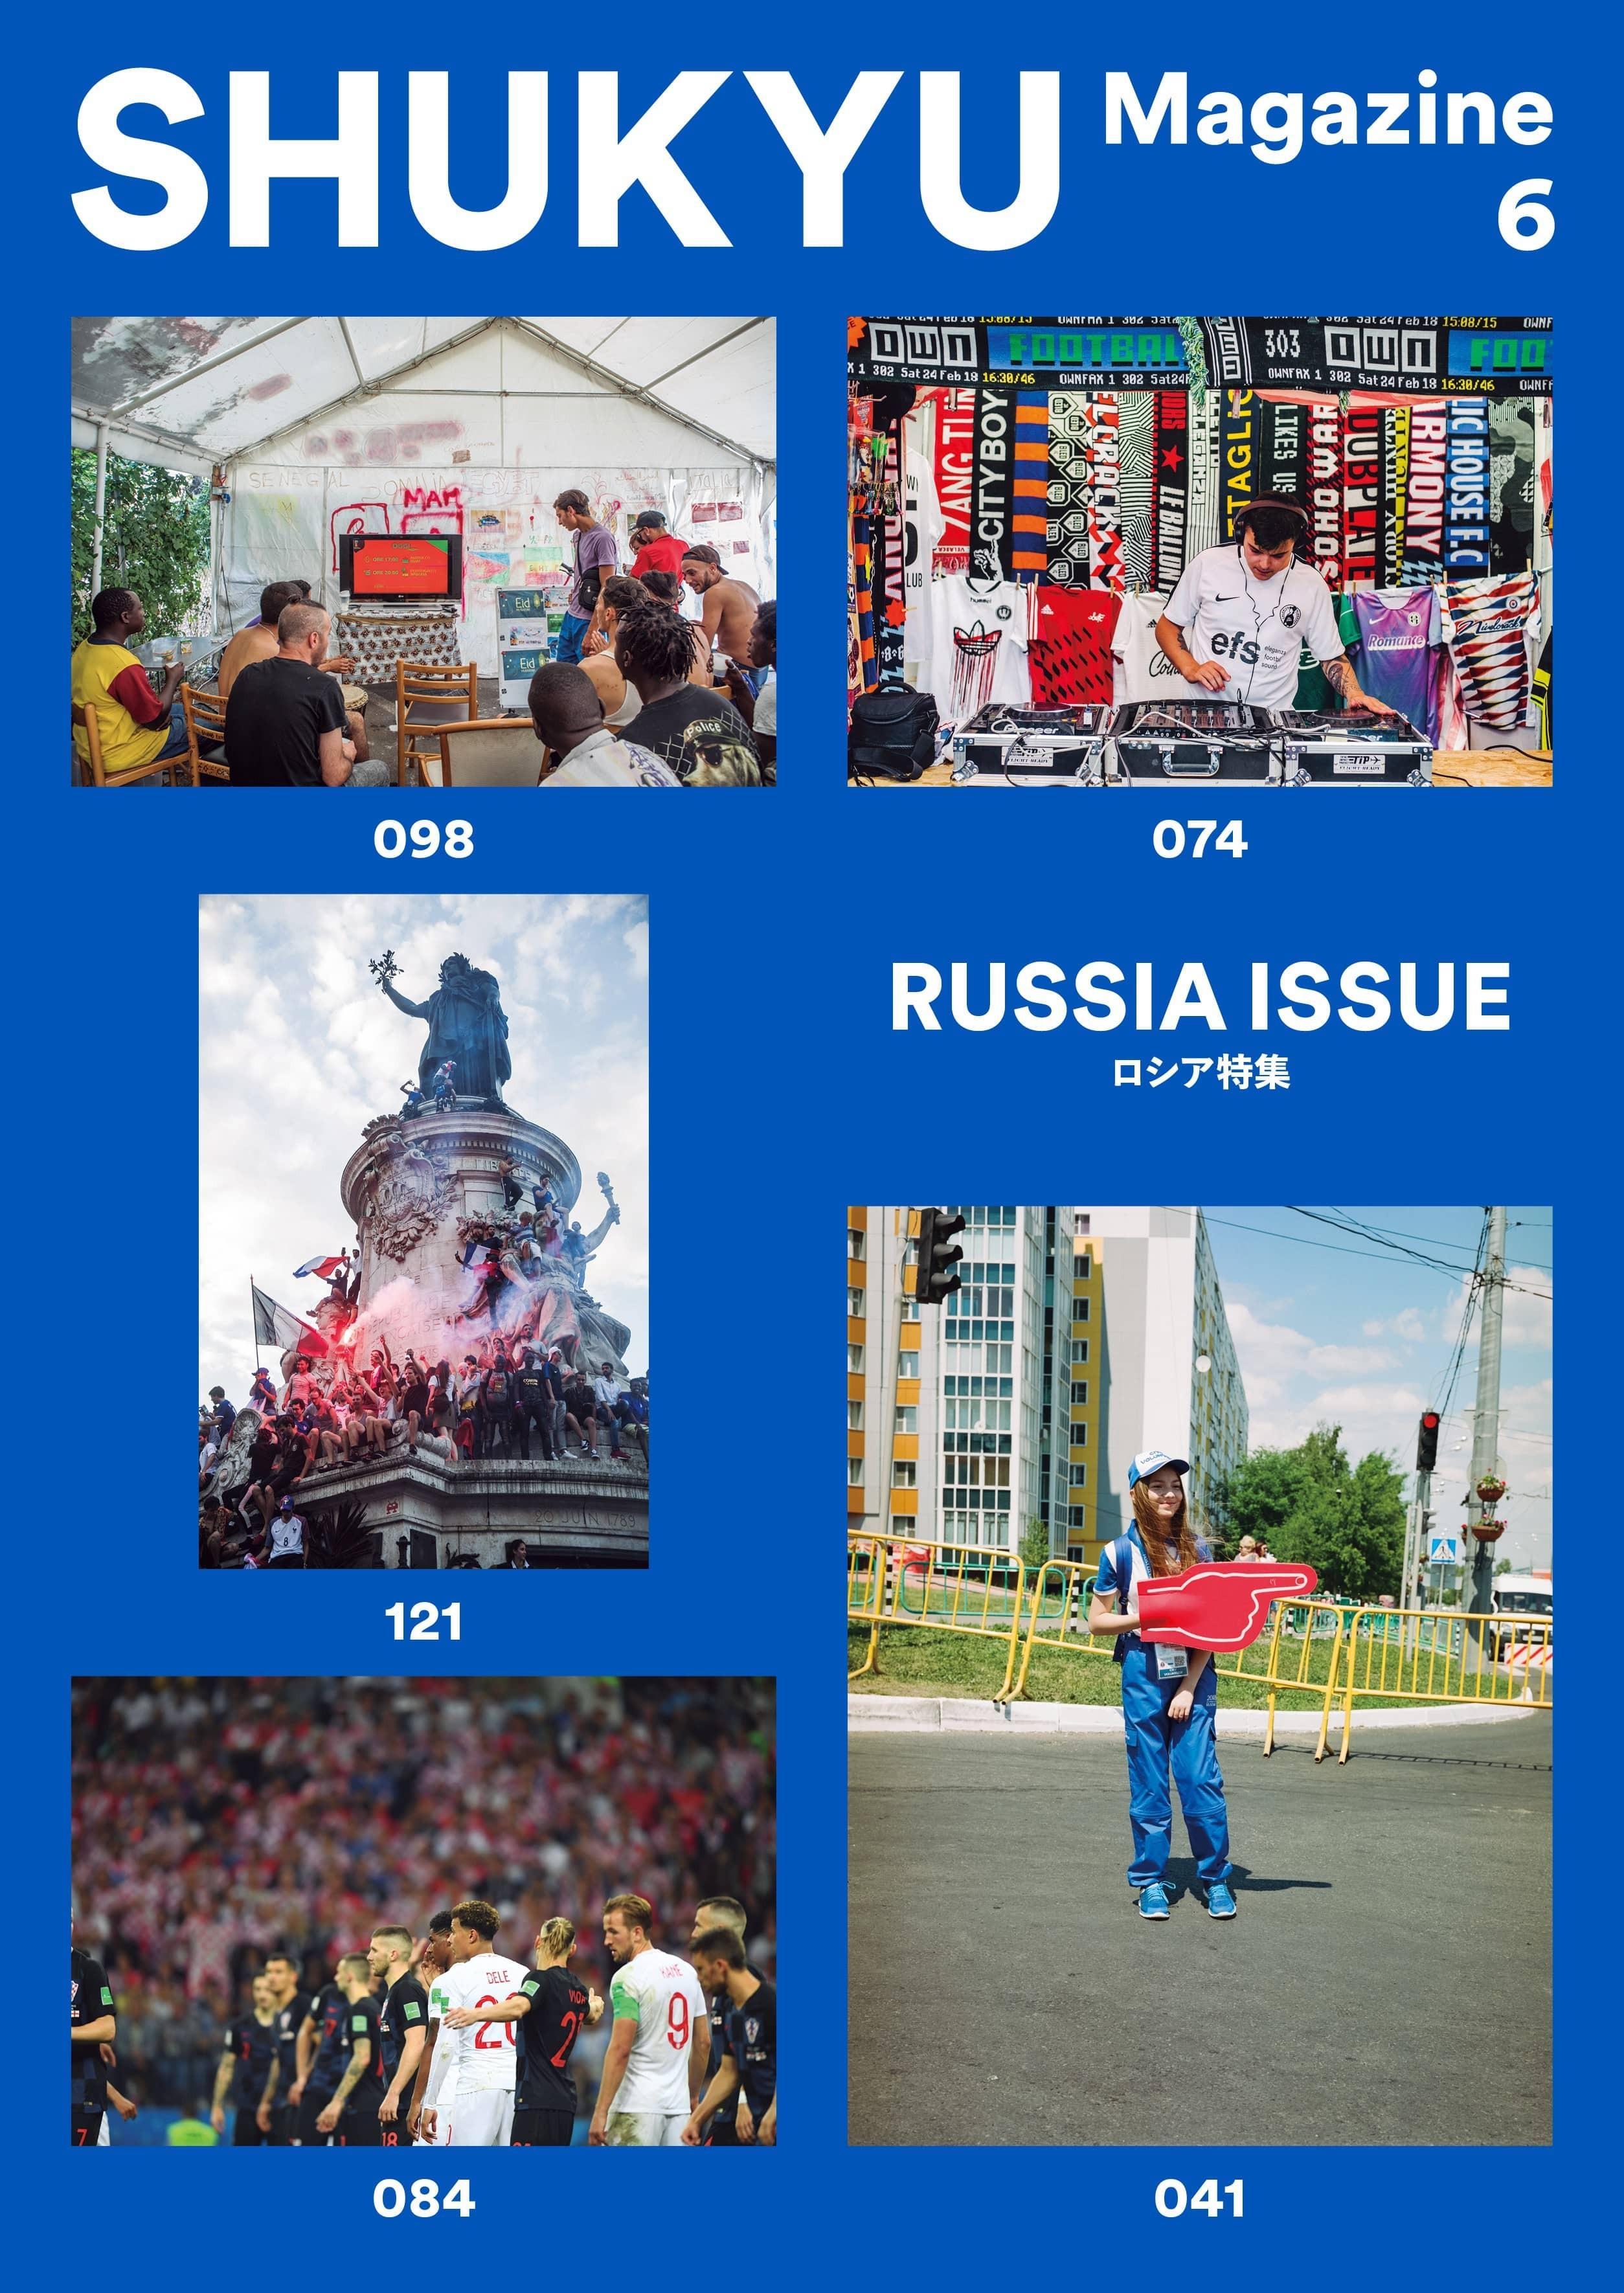 SHUKYU Magazine ROOTS ISSUE Vol.6 | SHUKYU MAGAZINE